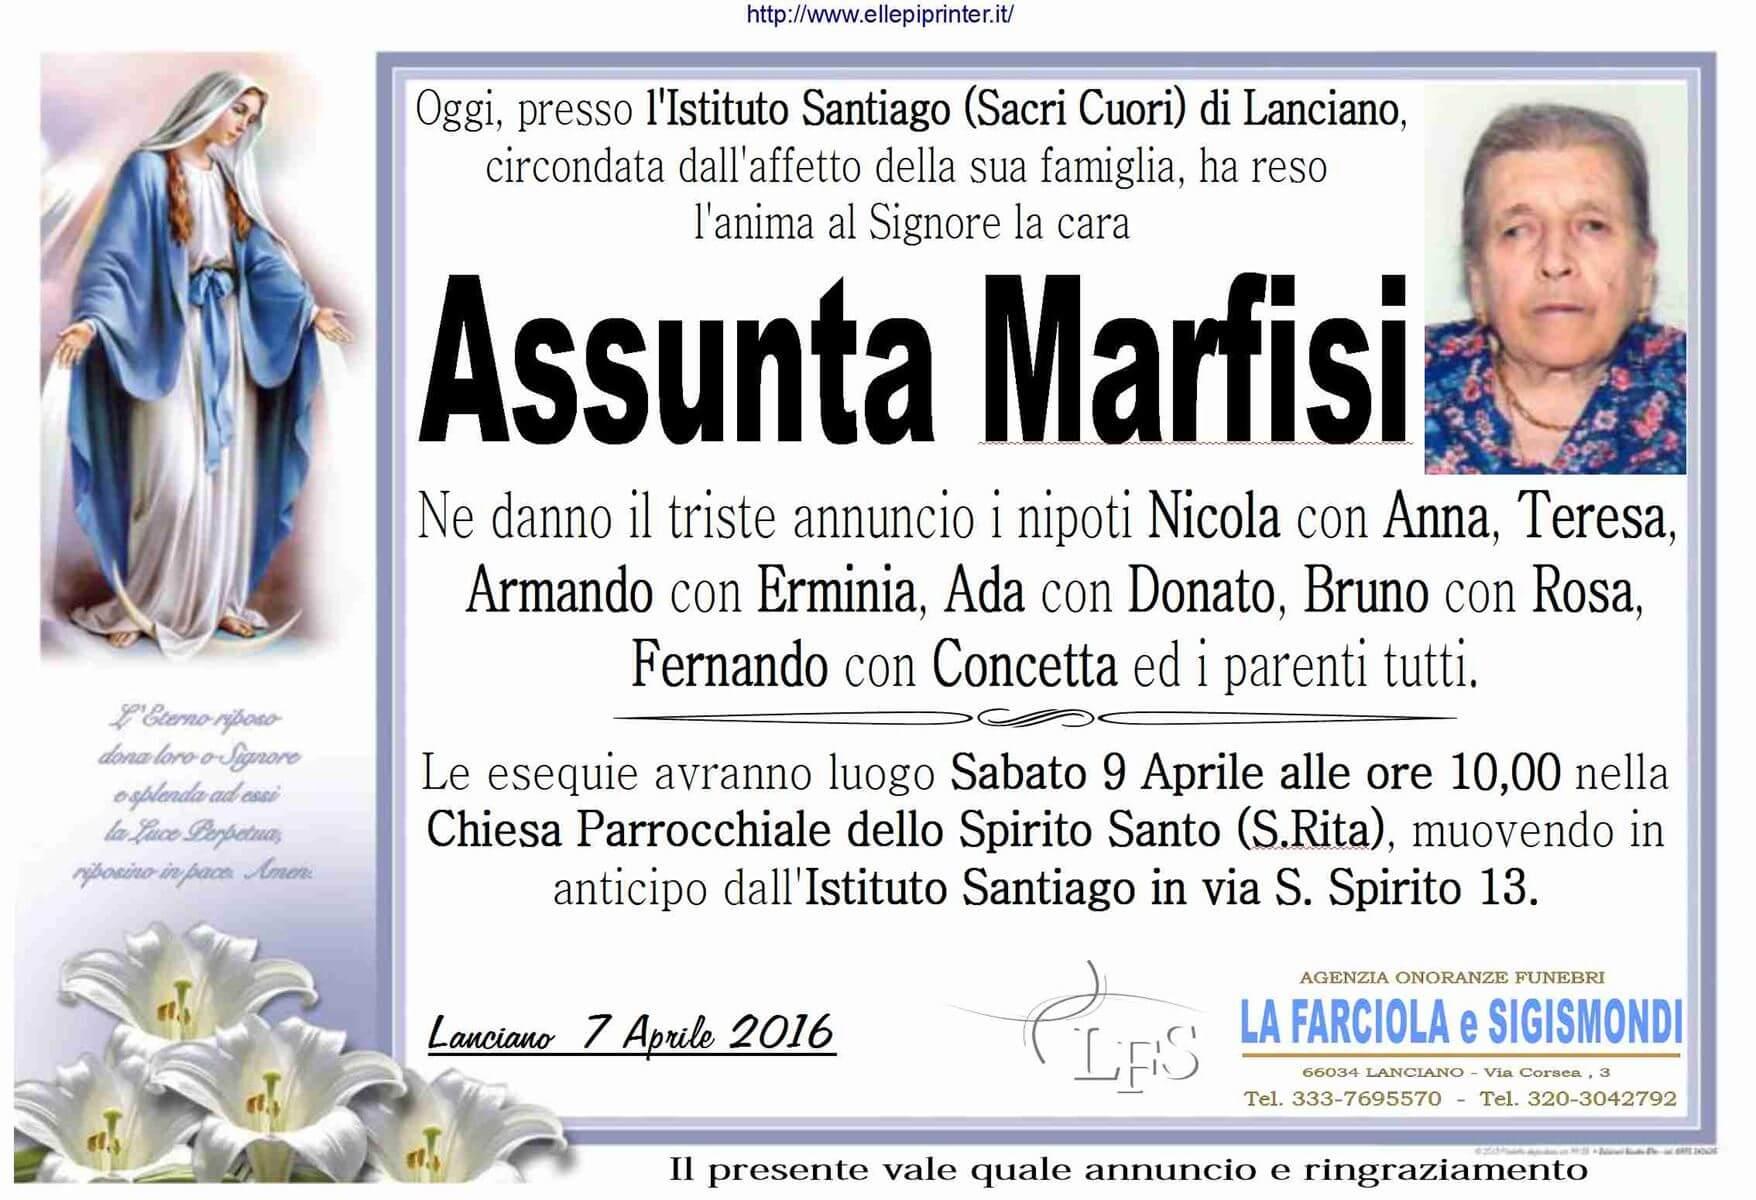 MANIFESTO MARFISI ASSUNTA